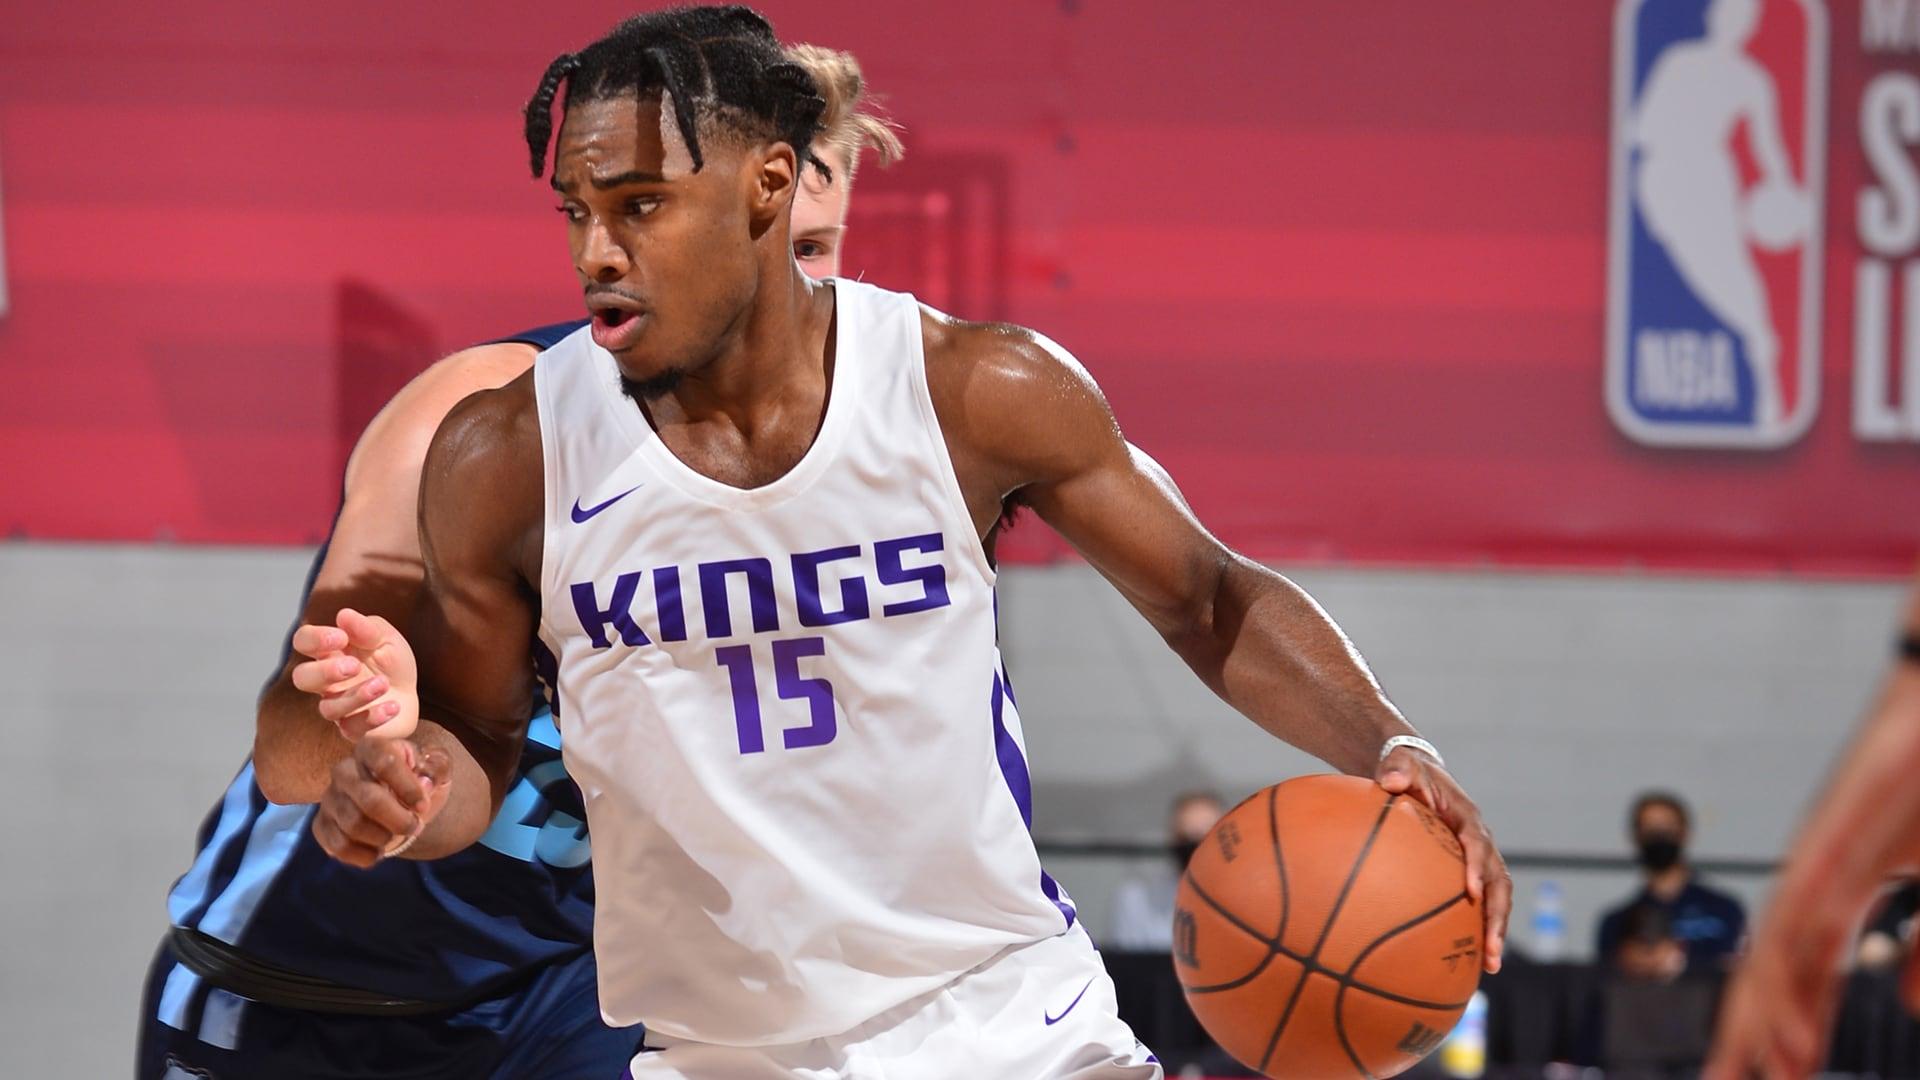 Las Vegas Summer League: Davion Mitchell helps Kings drop Grizzlies